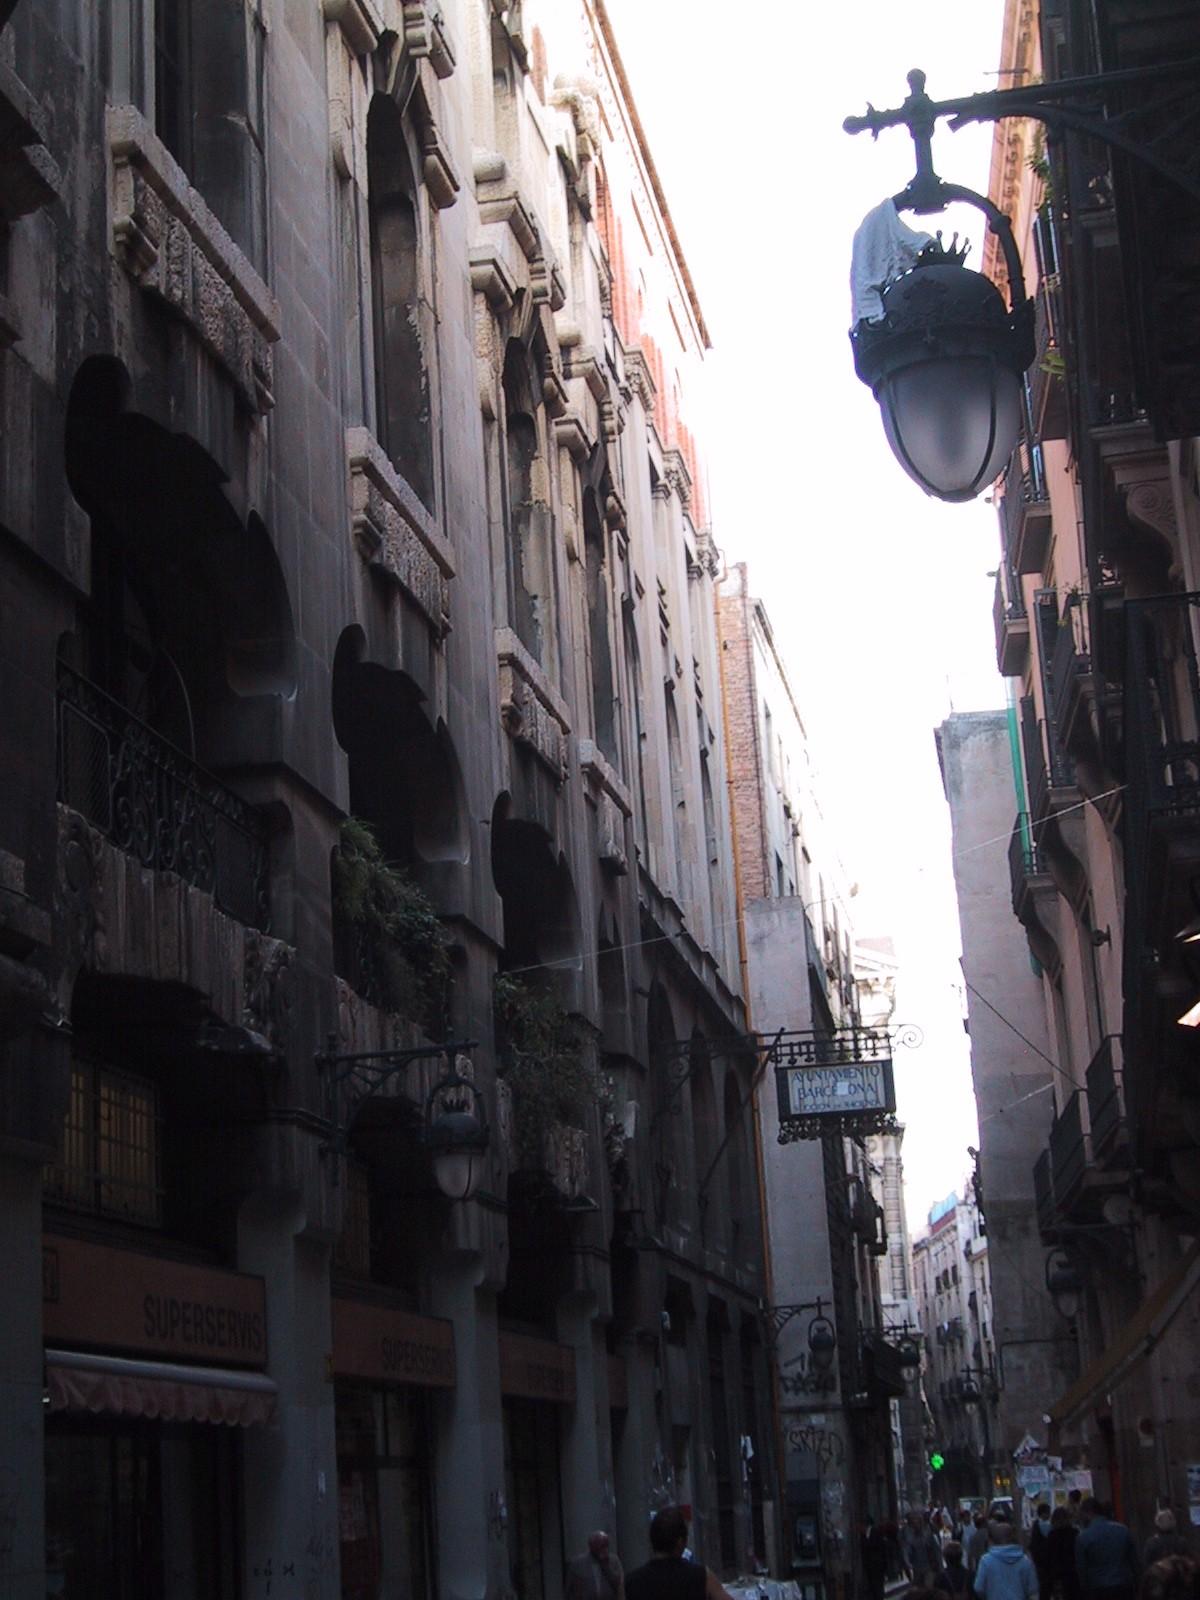 architecture exteriors cityscape street barcalona spain crowd